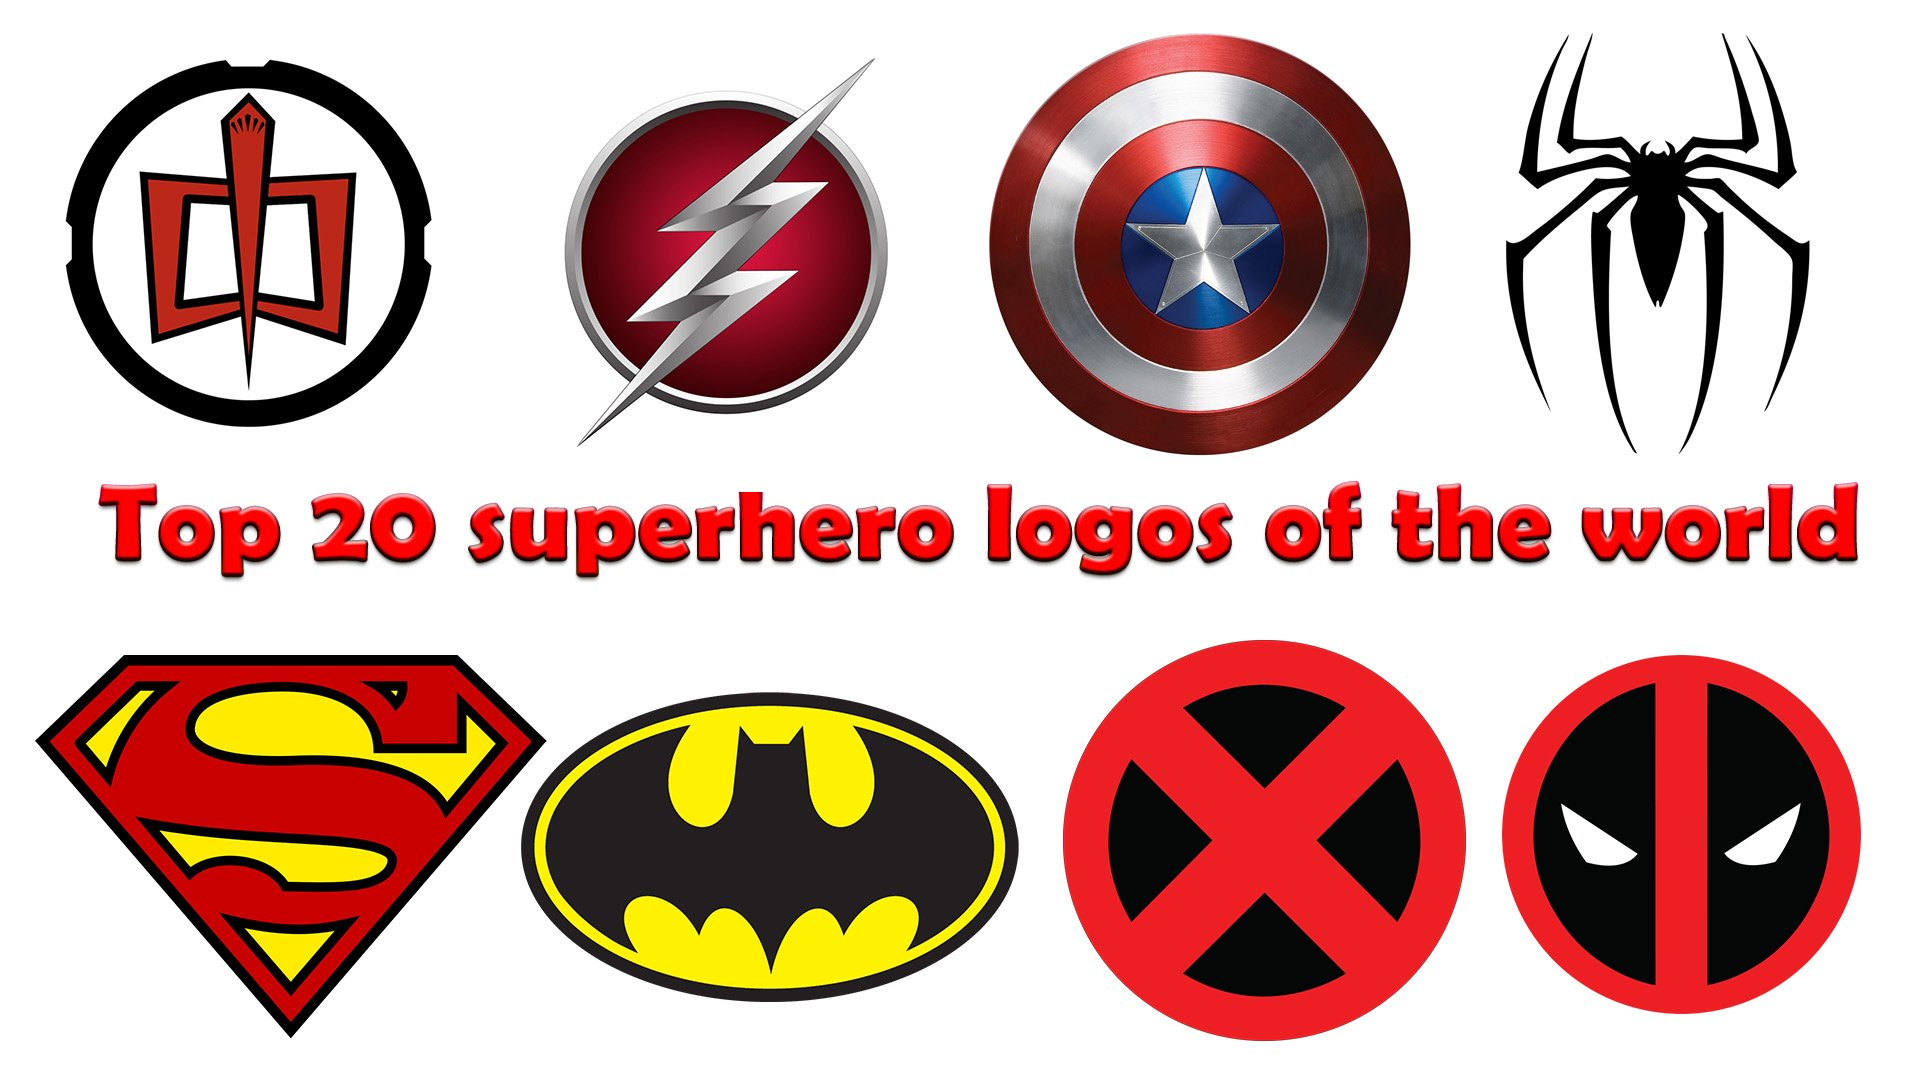 Top 20 superhero logos of the world - photo#11